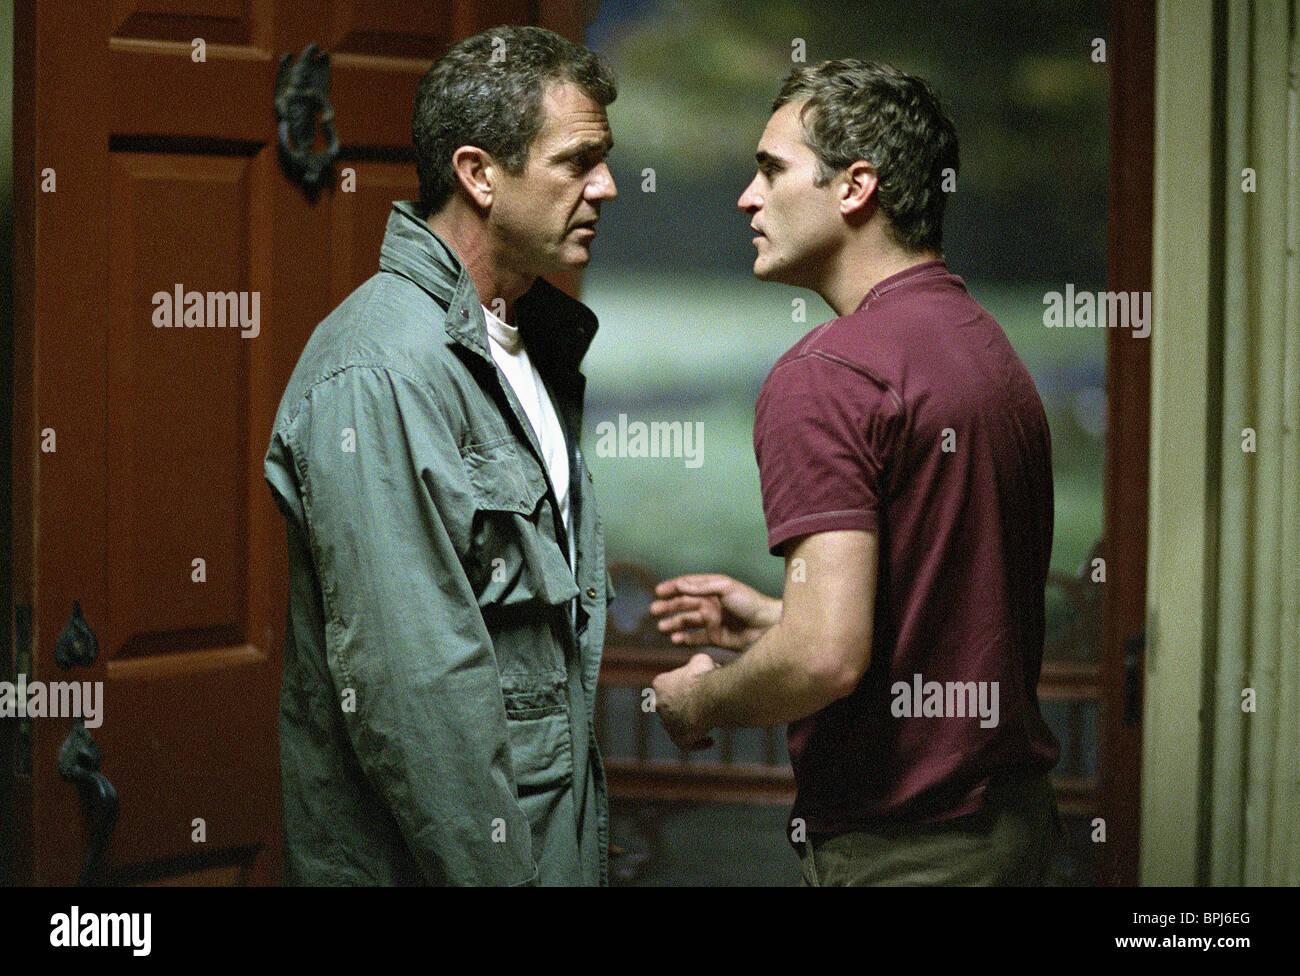 Mel Gibson Joaquin Phoenix Signs 2002 Stock Photo Alamy